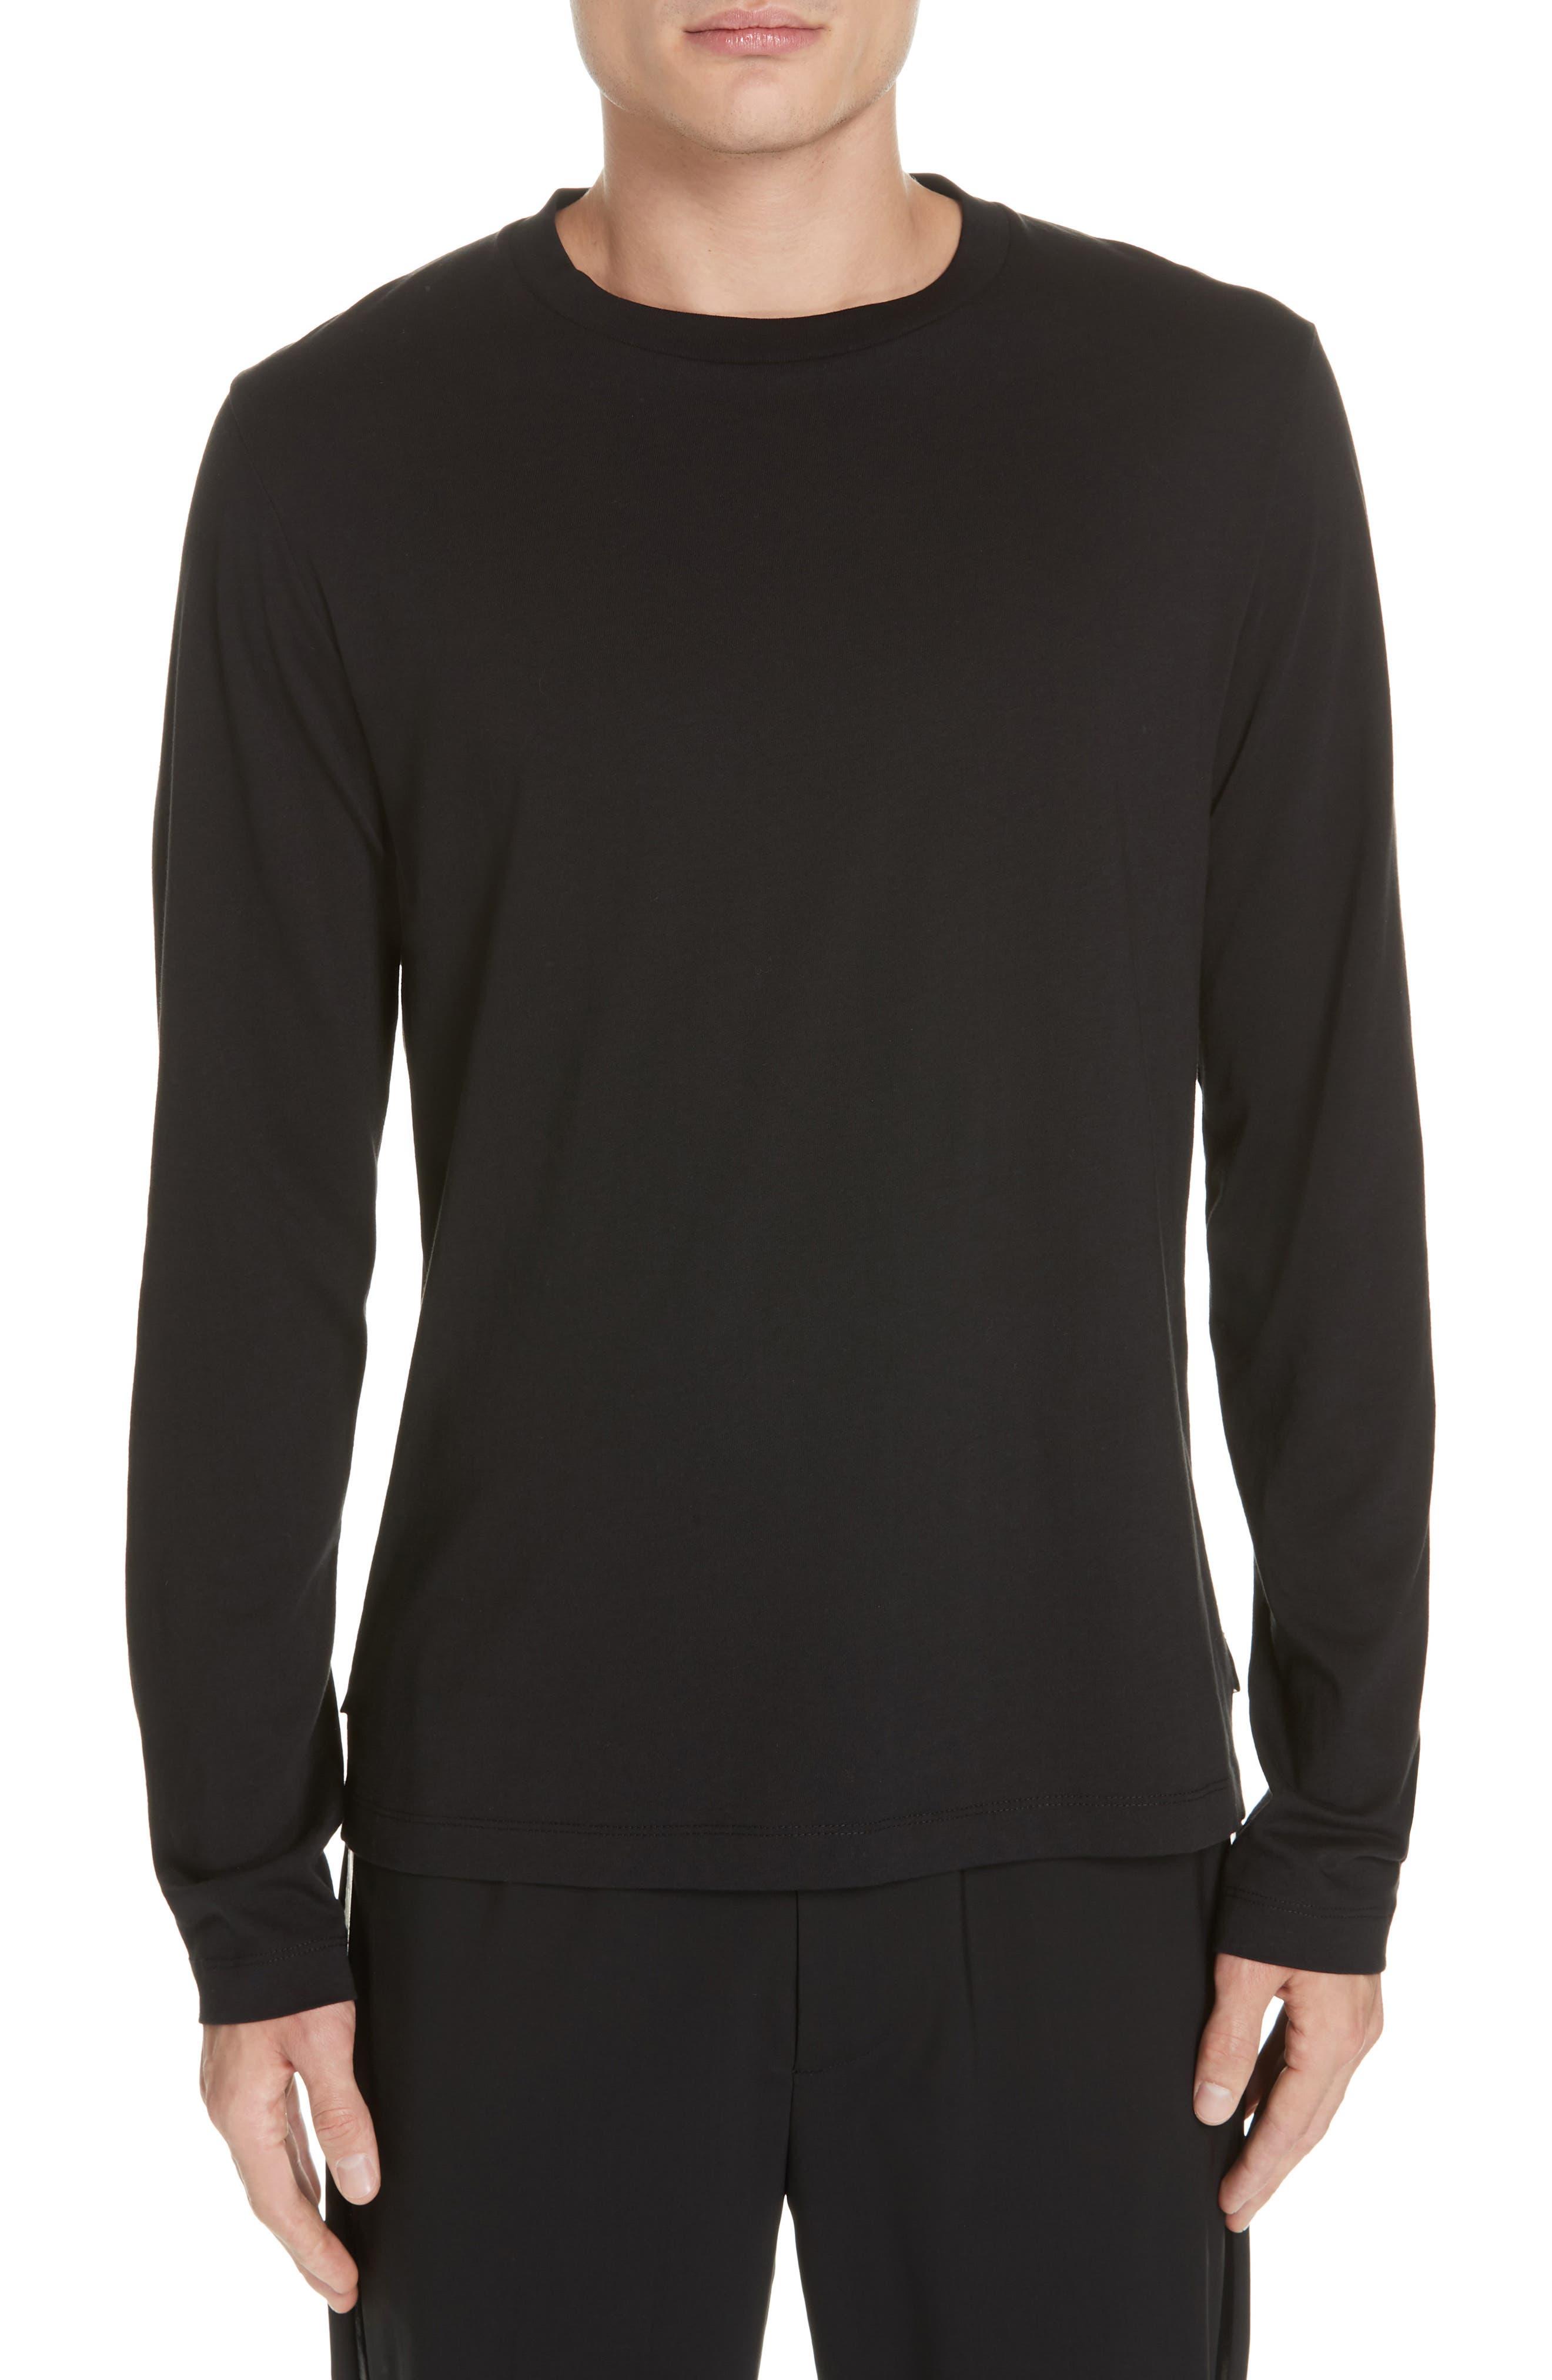 Overlay Long Sleeve T-Shirt in Black